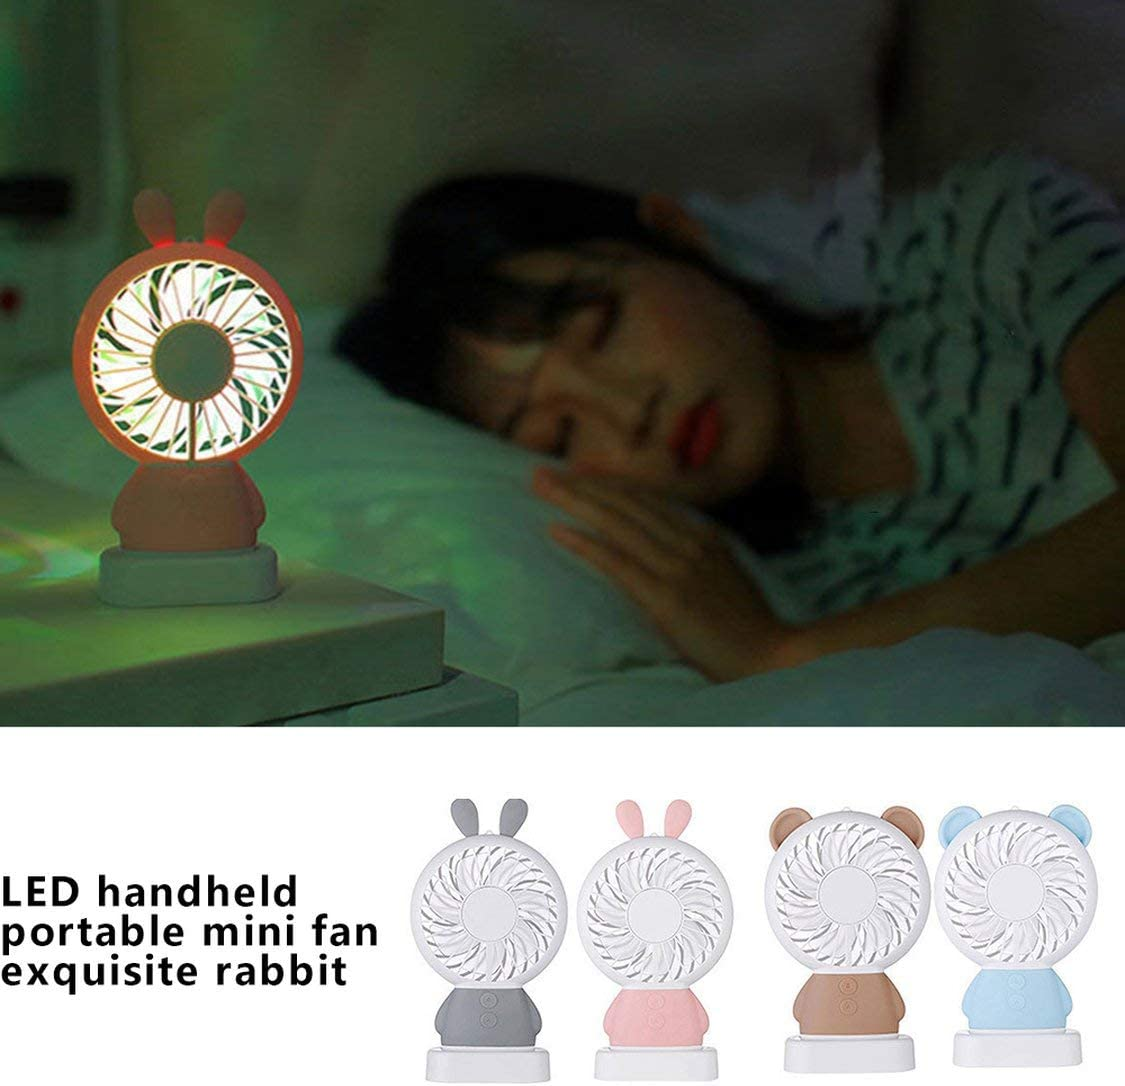 Creative-USB-Lade kleiner Ventilator Led Handportable Mini Lade Bunte Nachtlicht Studenten Fan-Gray